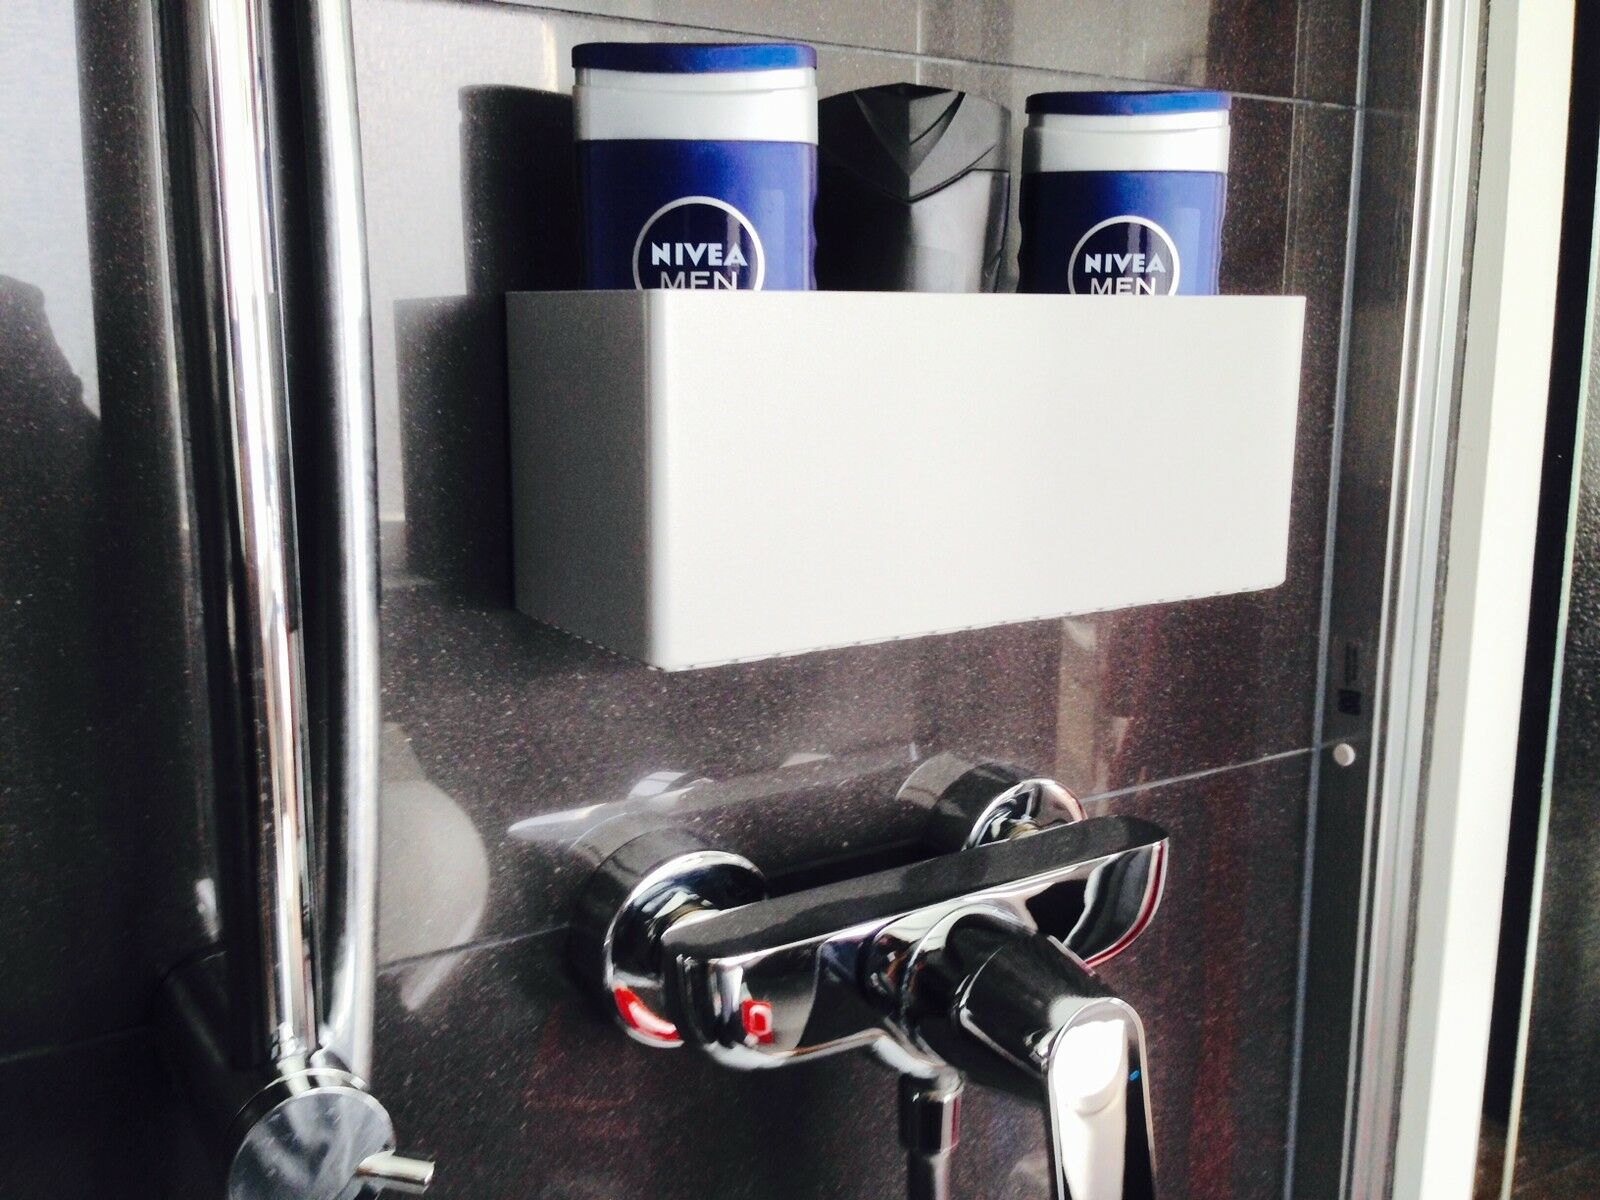 duschregal silber loft design seifen shampoo regal bad. Black Bedroom Furniture Sets. Home Design Ideas